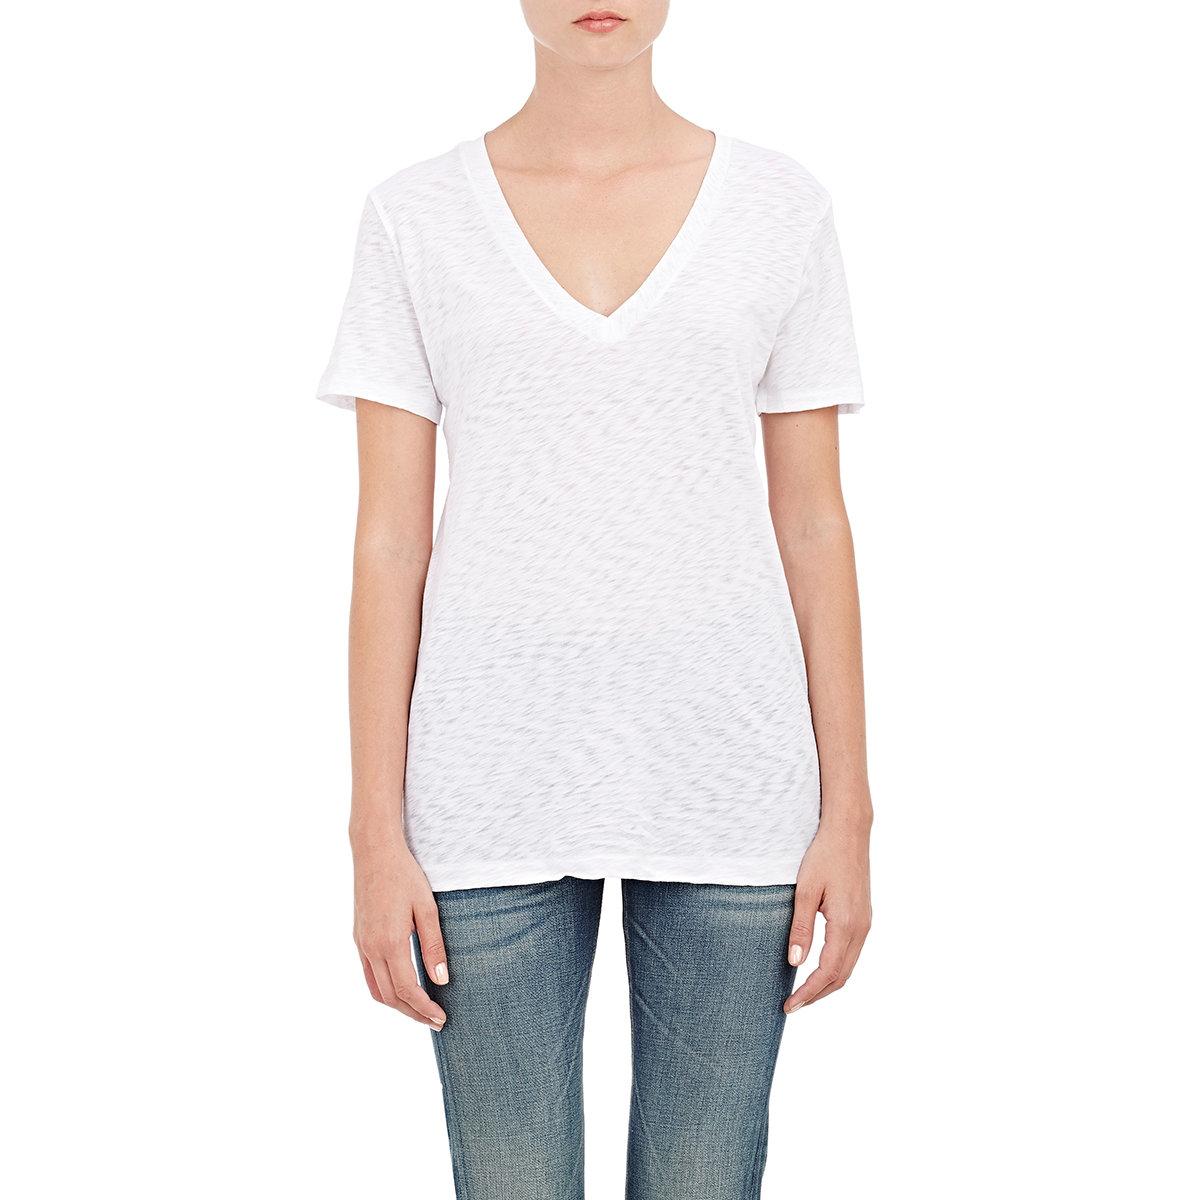 Lyst rag bone women 39 s the classic v t shirt in white for Rag and bone white t shirt